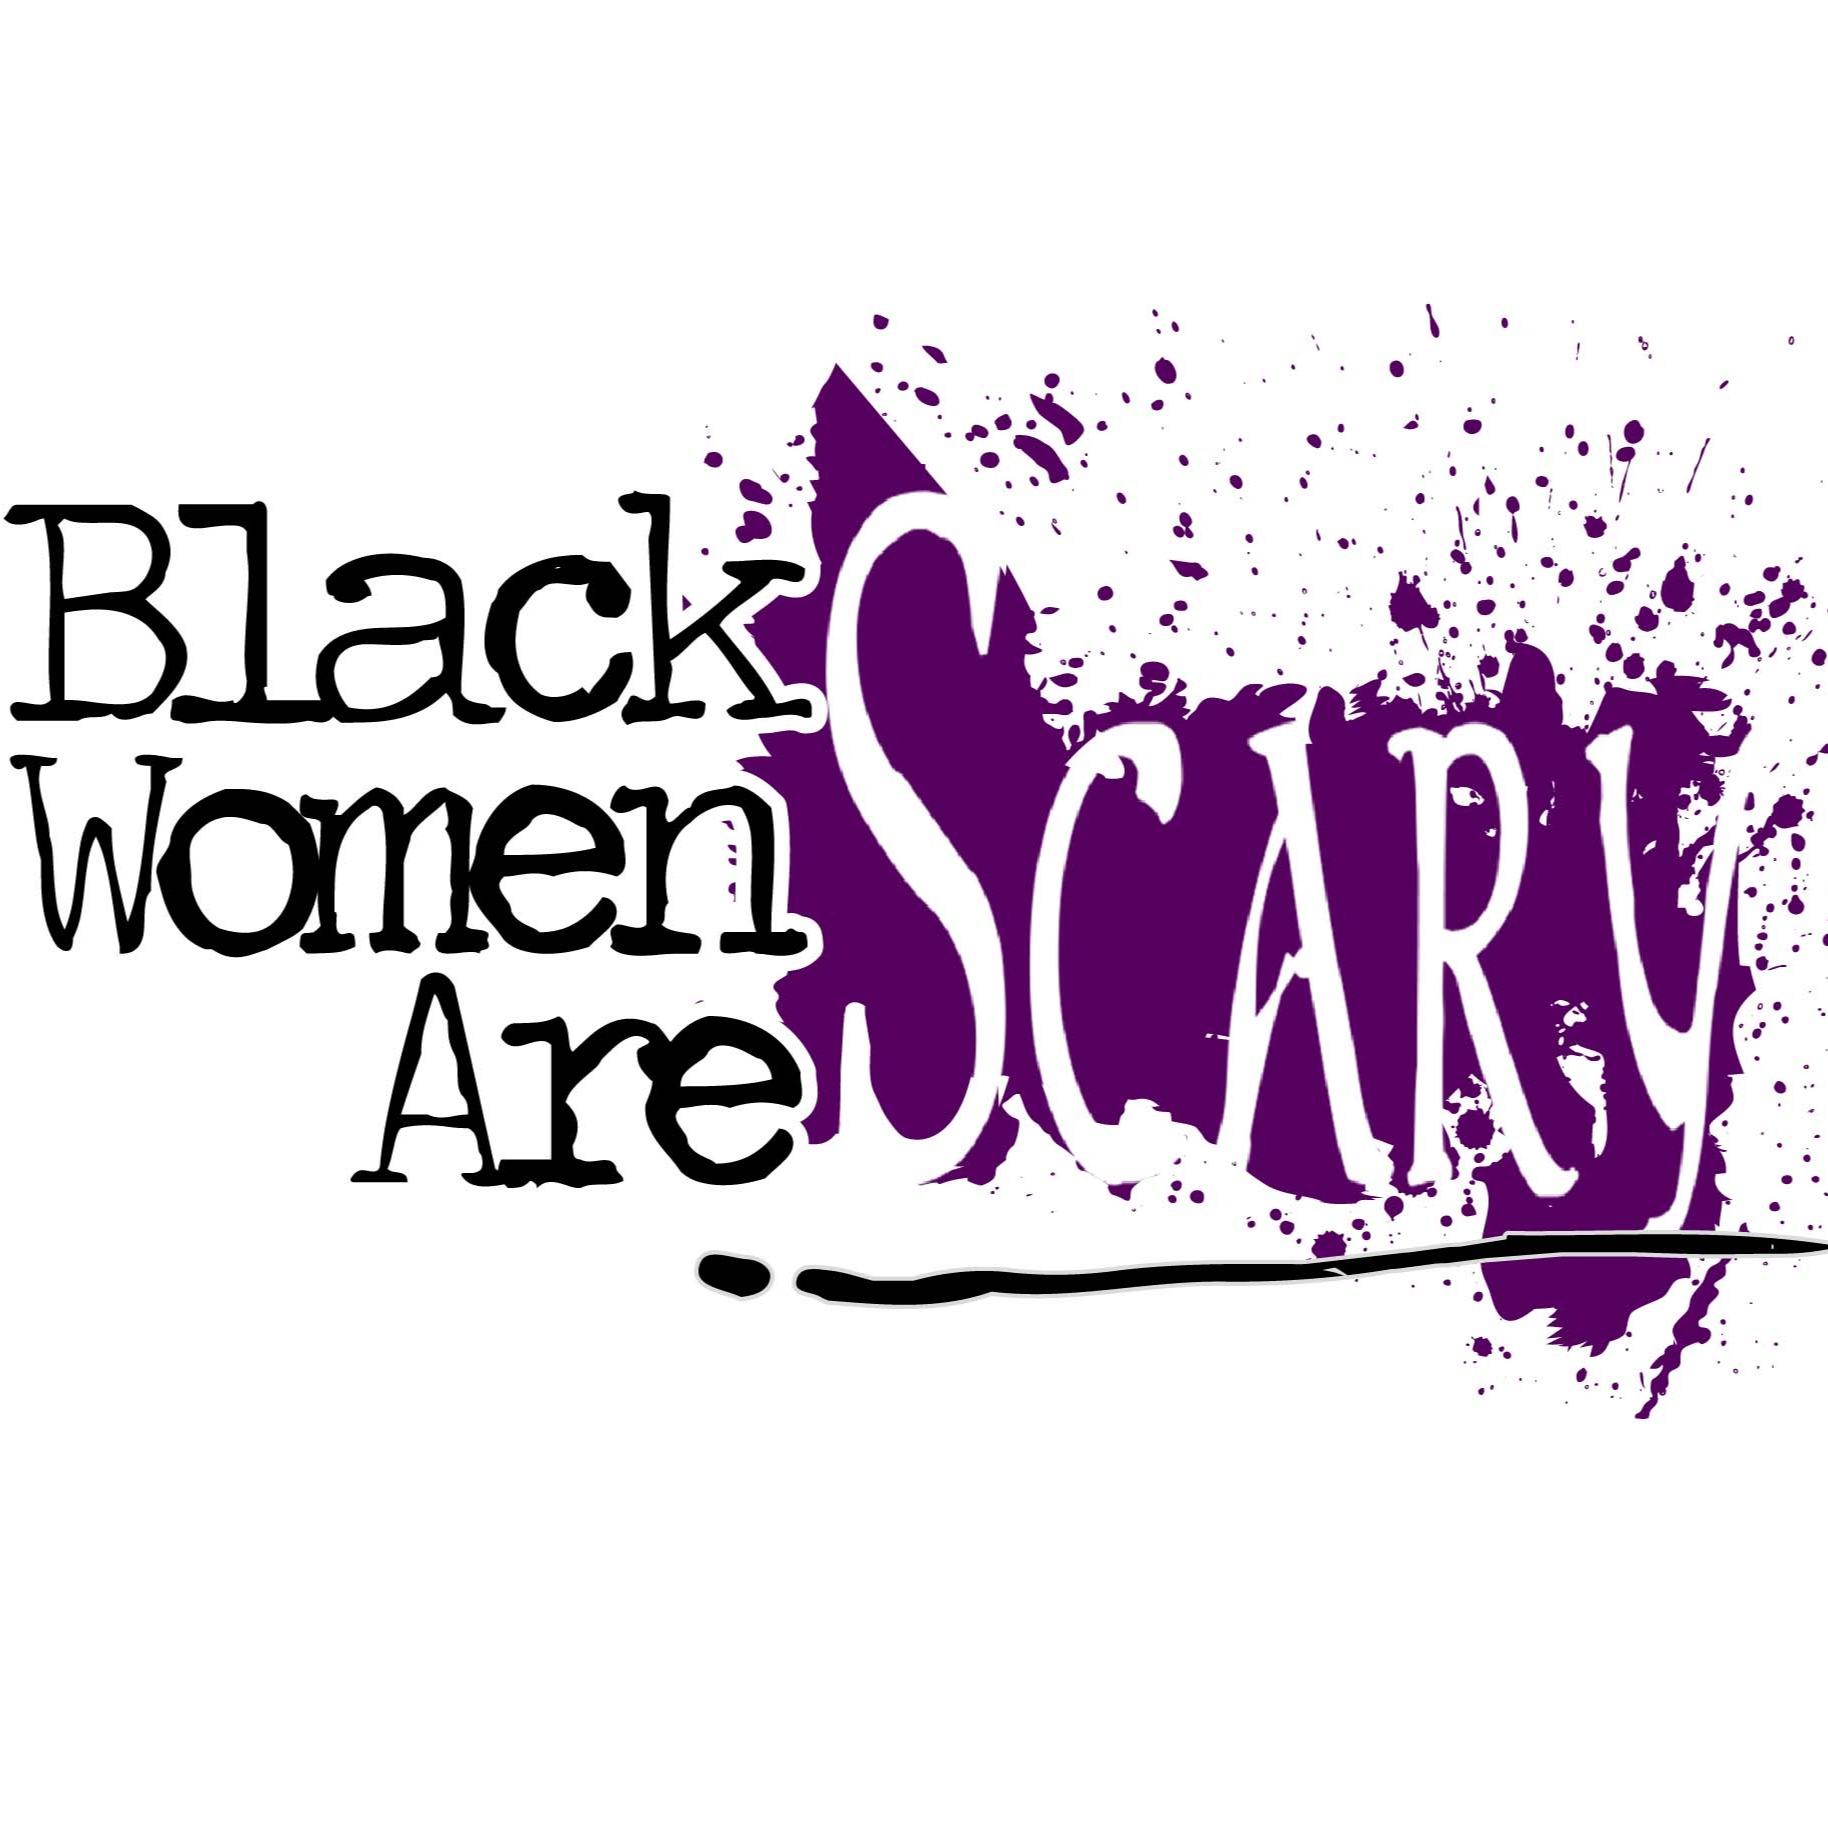 @blackwomenarescary Profile Image | Linktree